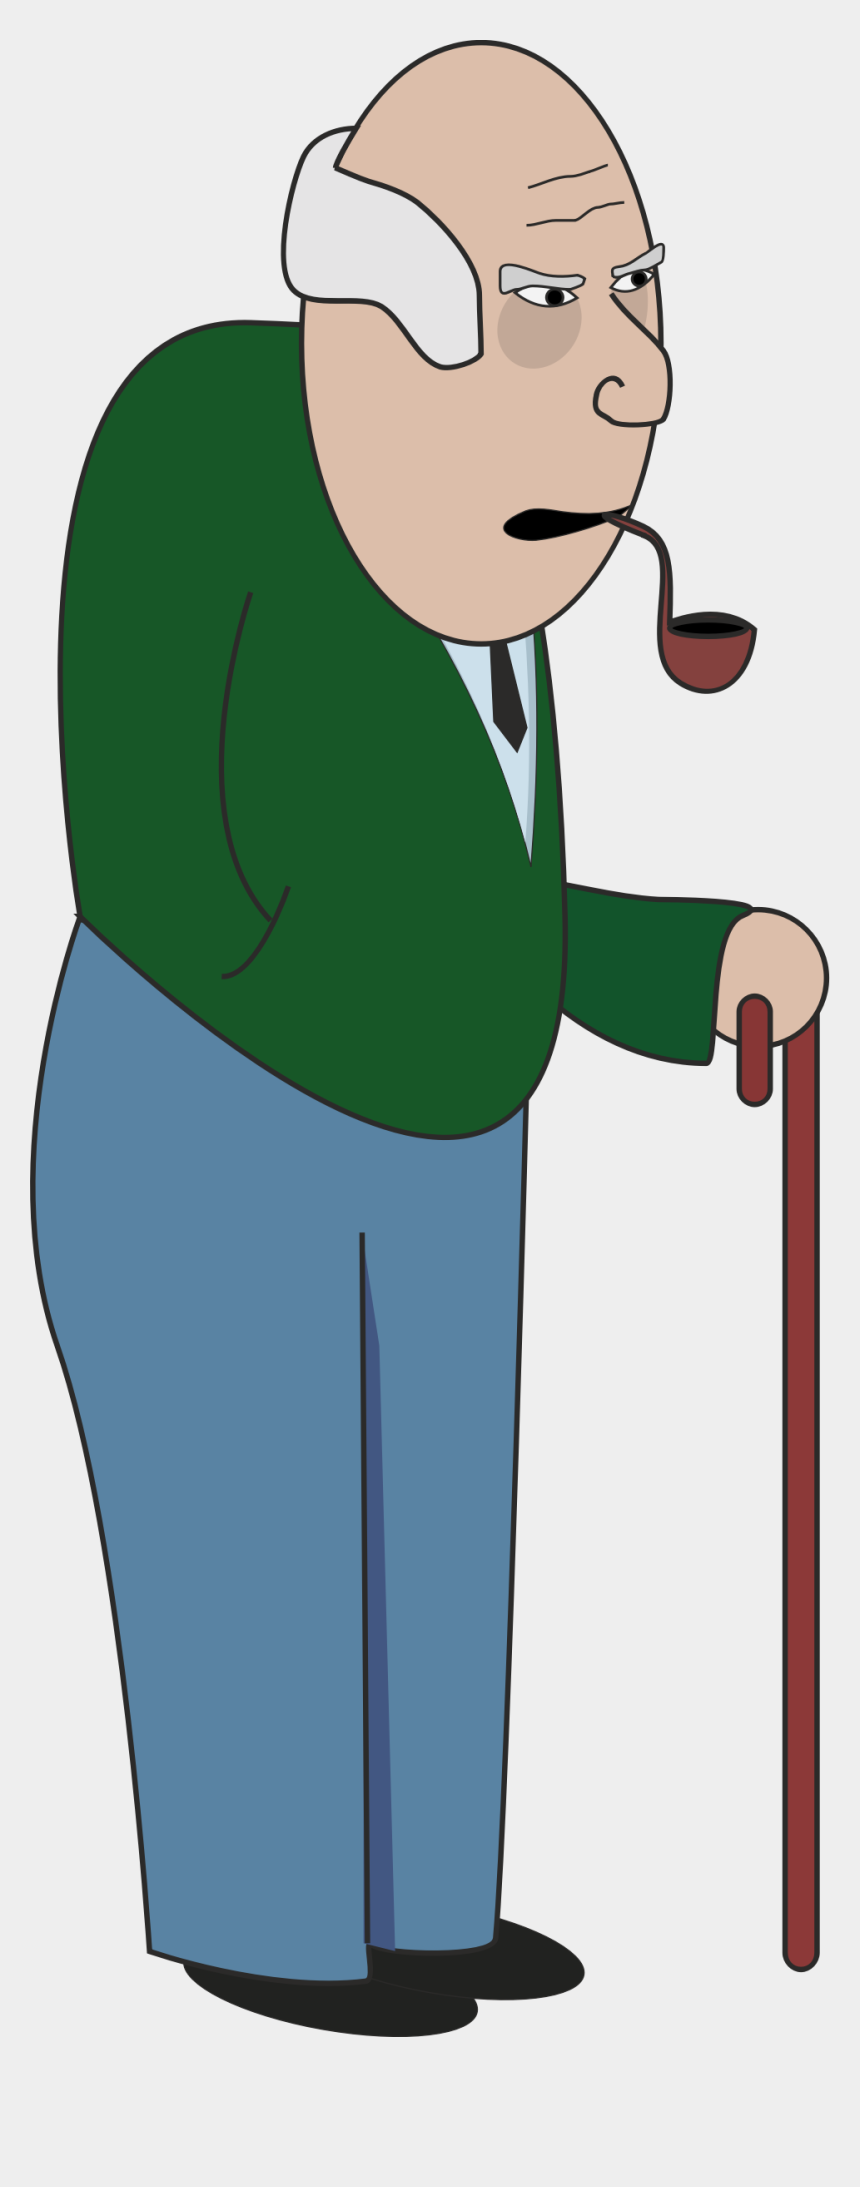 old man clipart, Cartoons - Clipart Walking Healthy Old Man - Clipart Grandpa